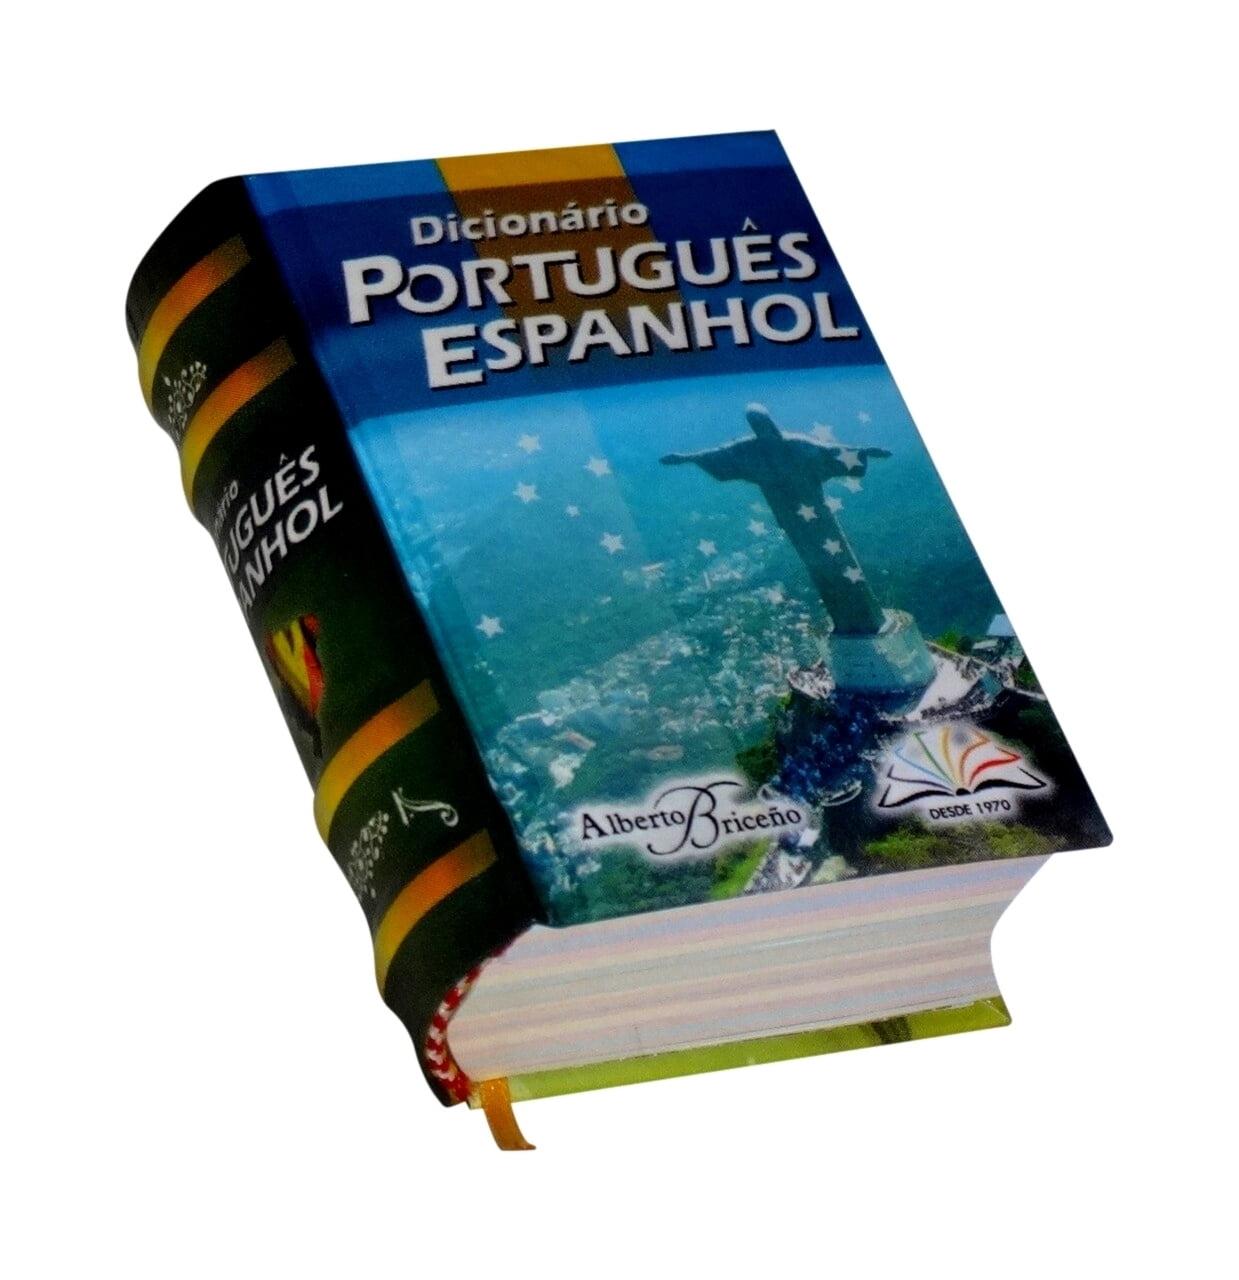 dicionario-portugues-espanhol-miniature-book-libro